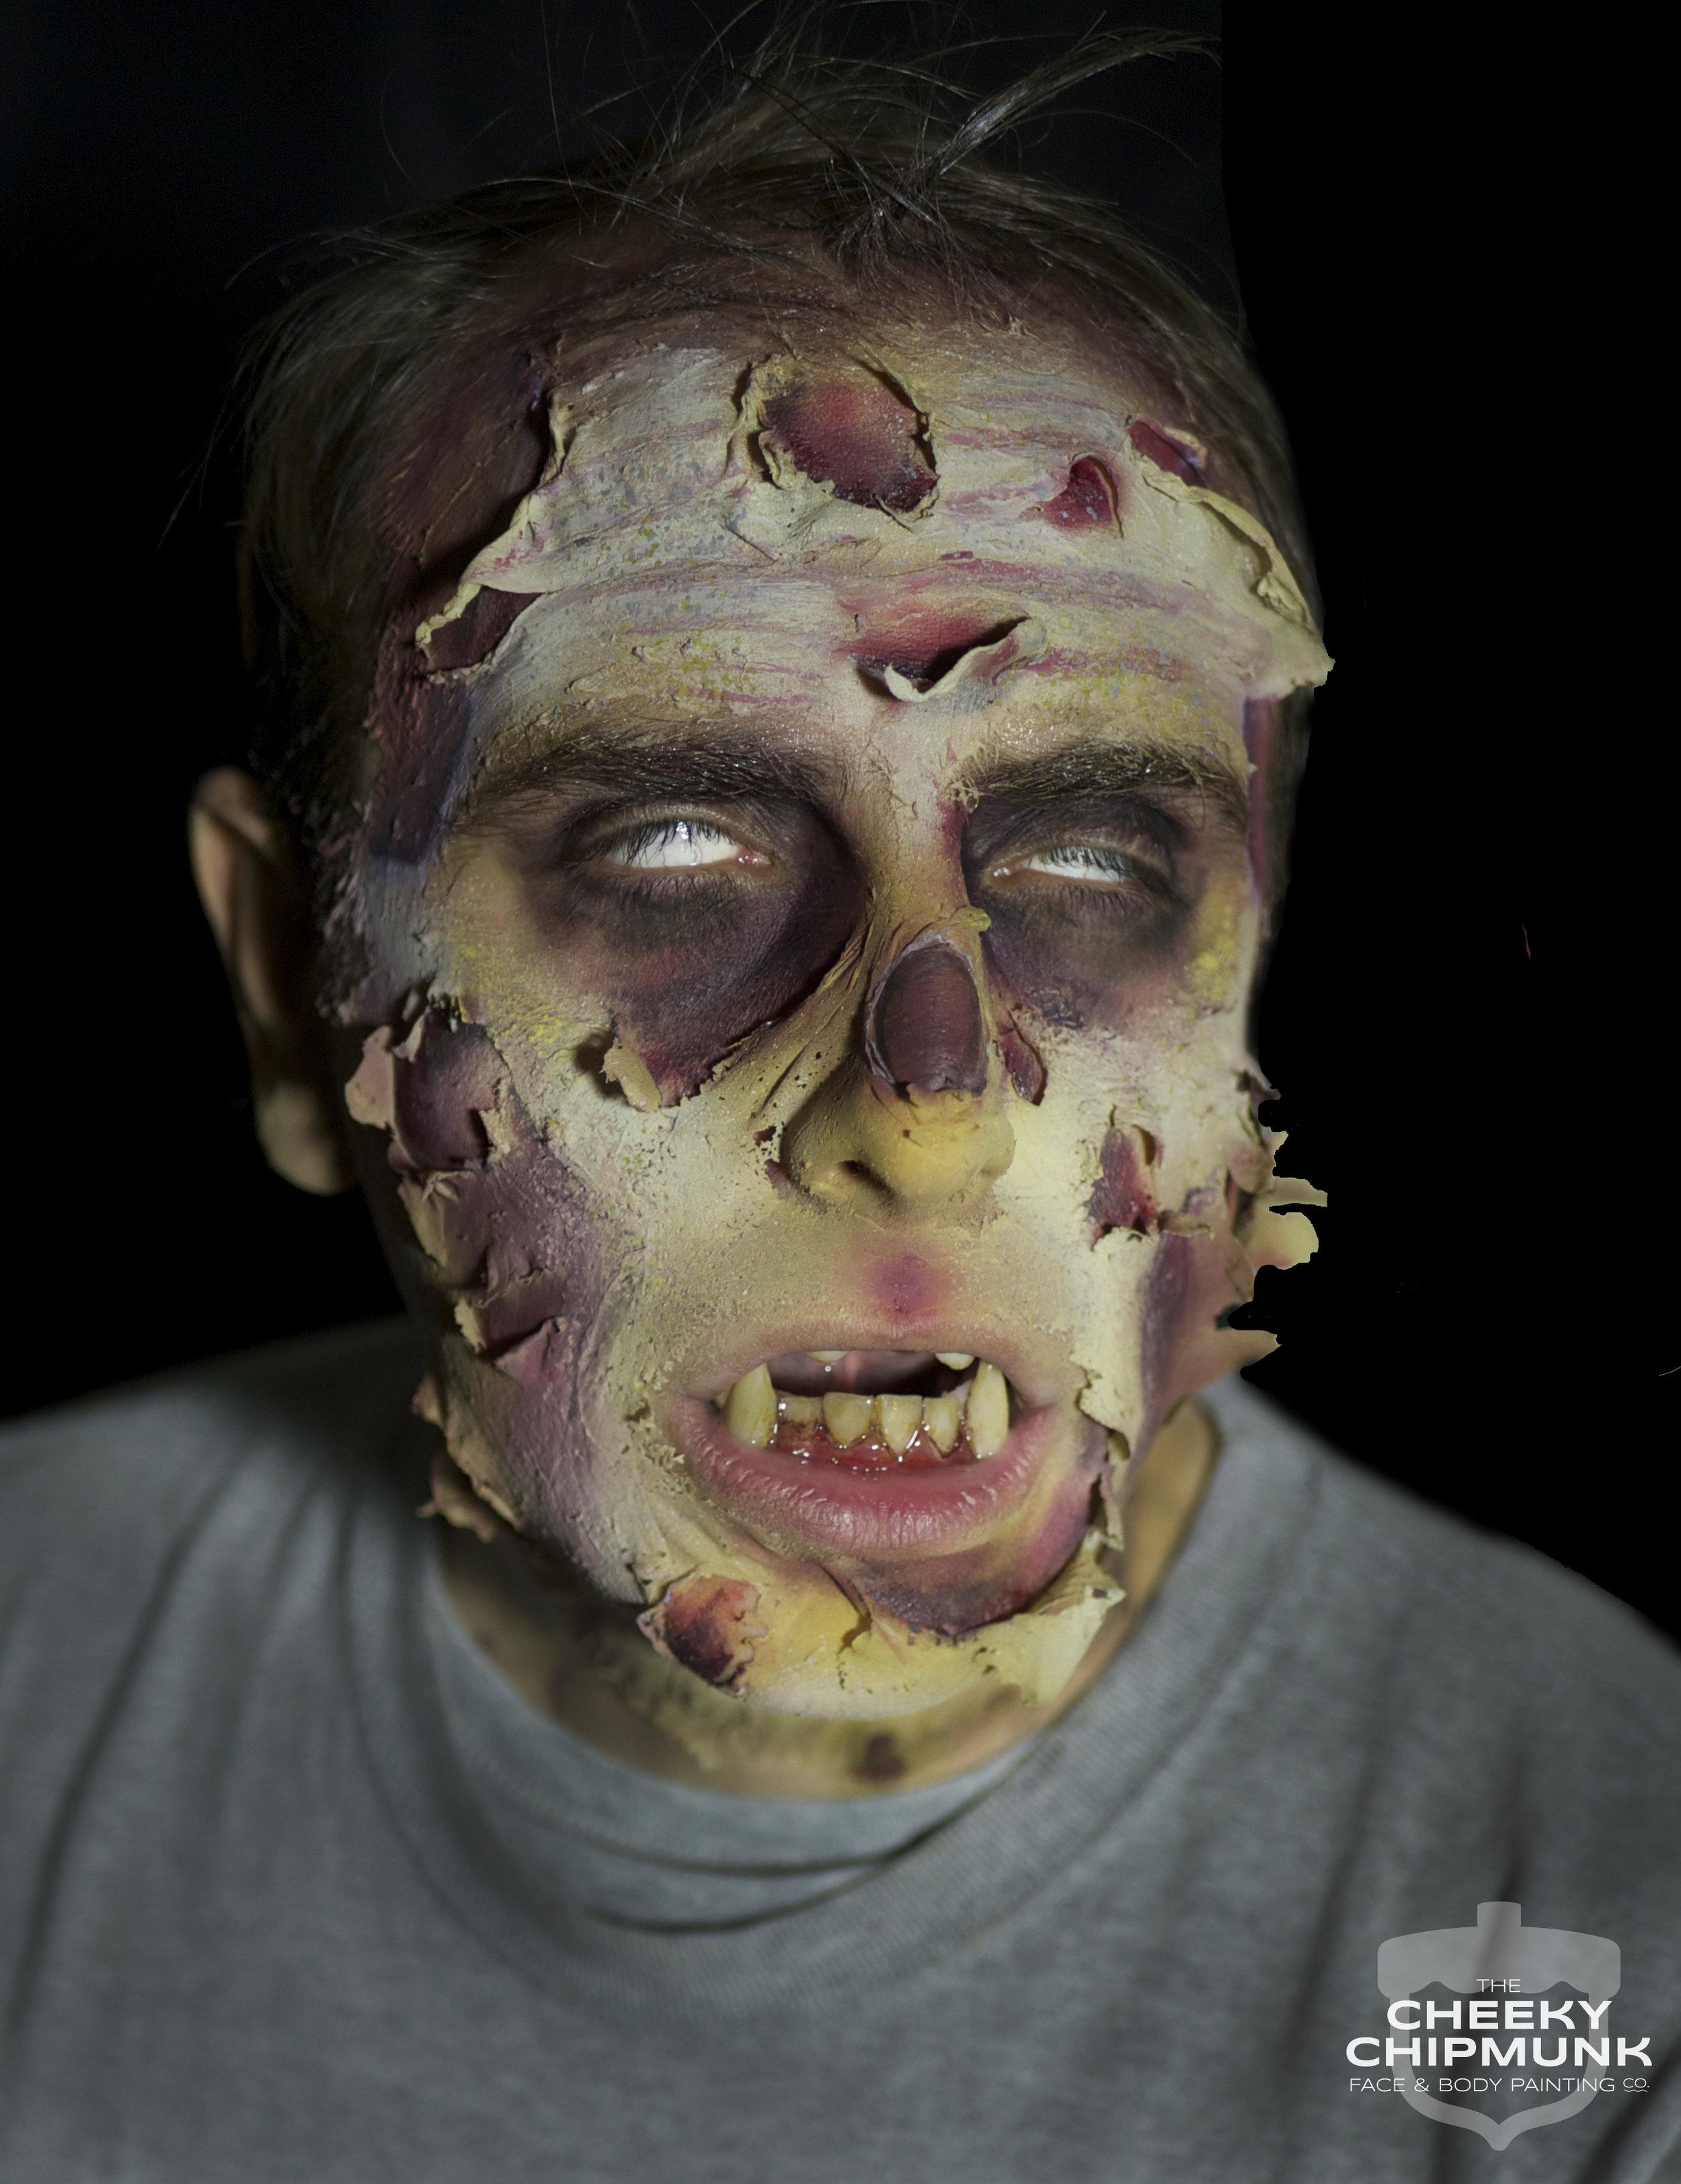 YODO_john_topher_sfx_zombieskin.jpg